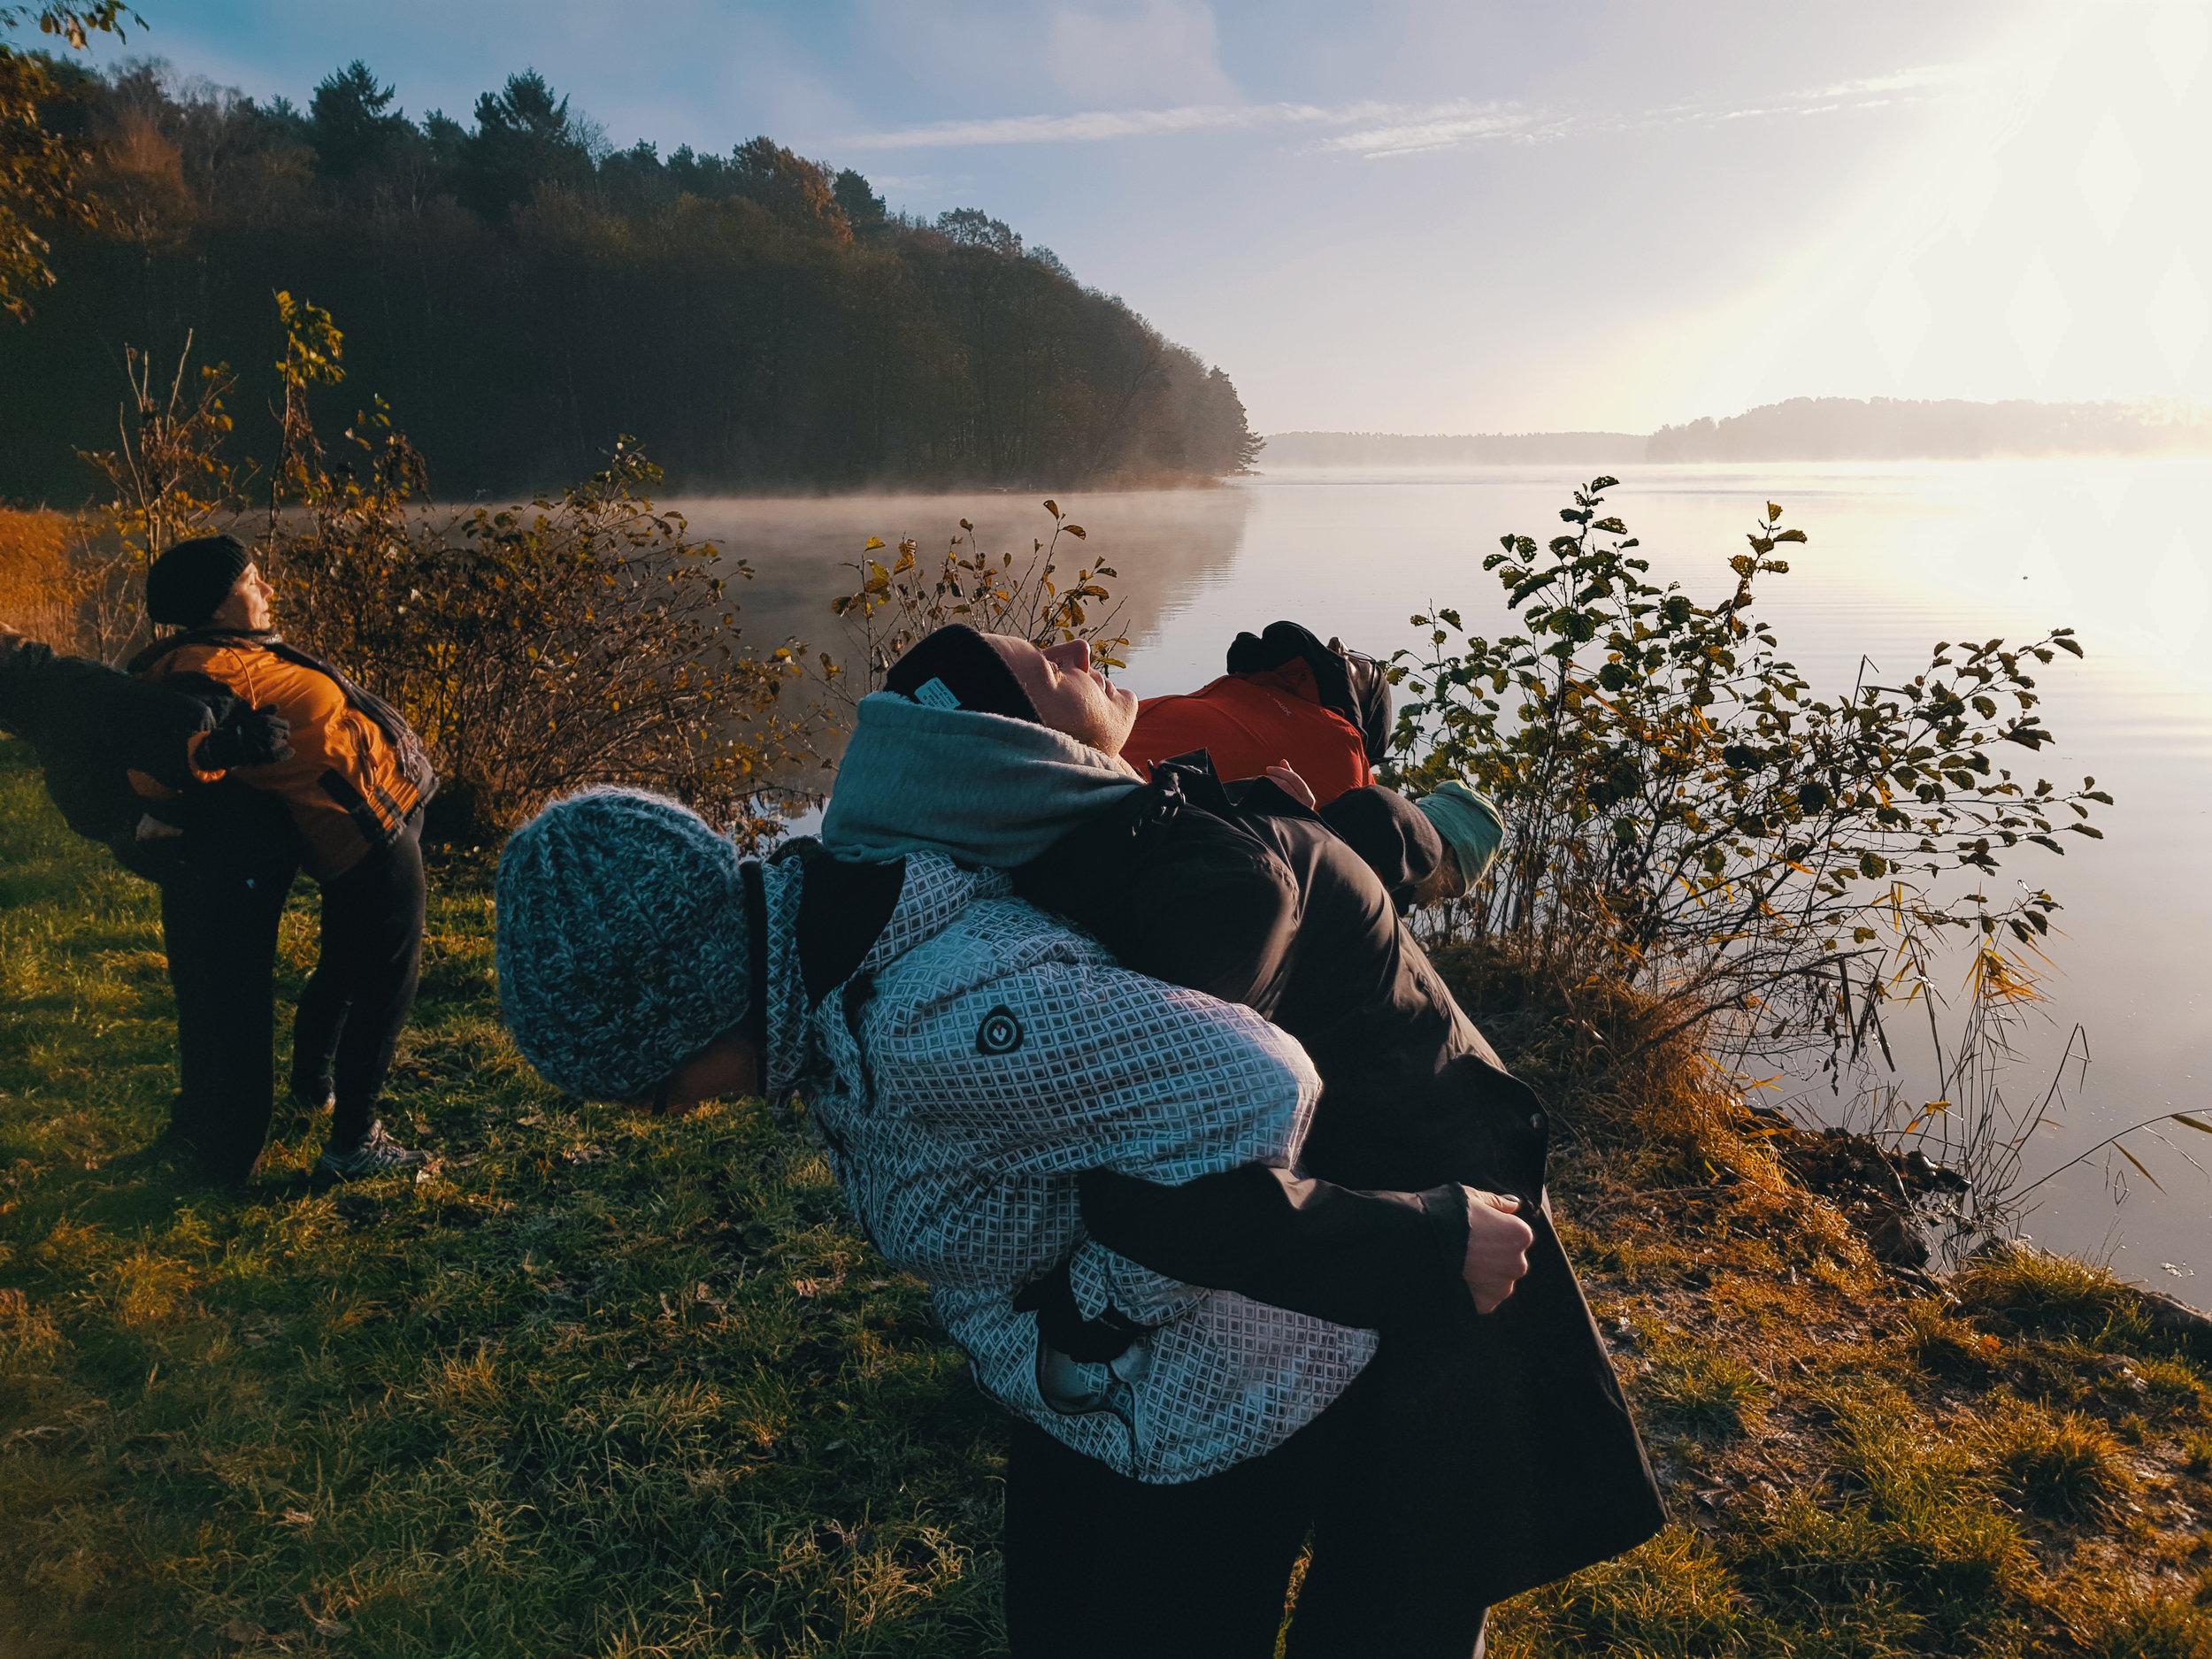 Morgengymnastik - Fastenwandern